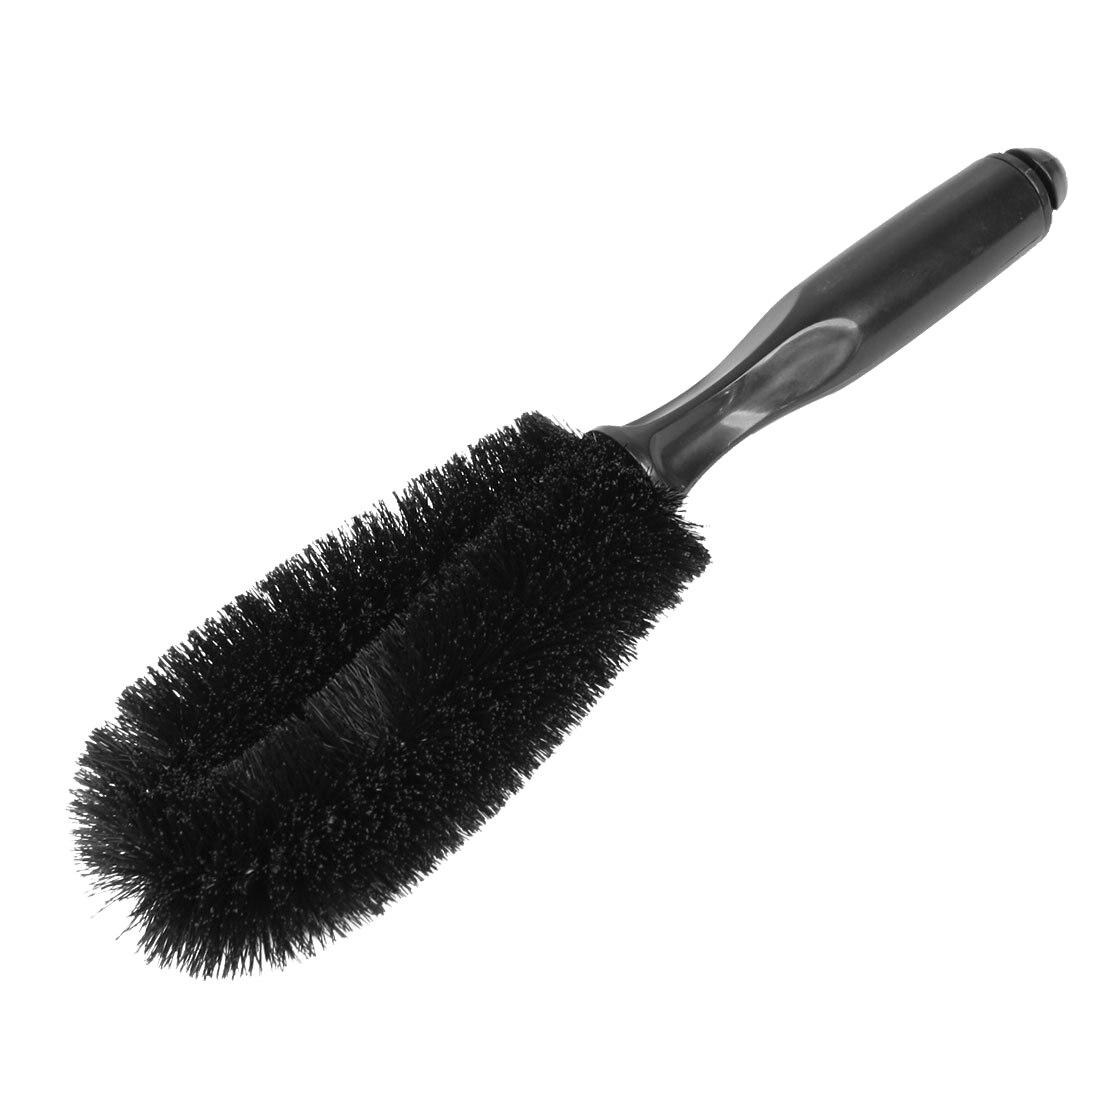 TOYL Black Truck Car TOYL Wheel Tire Rim Brush Wash Cleaning Tool 10.6 Long